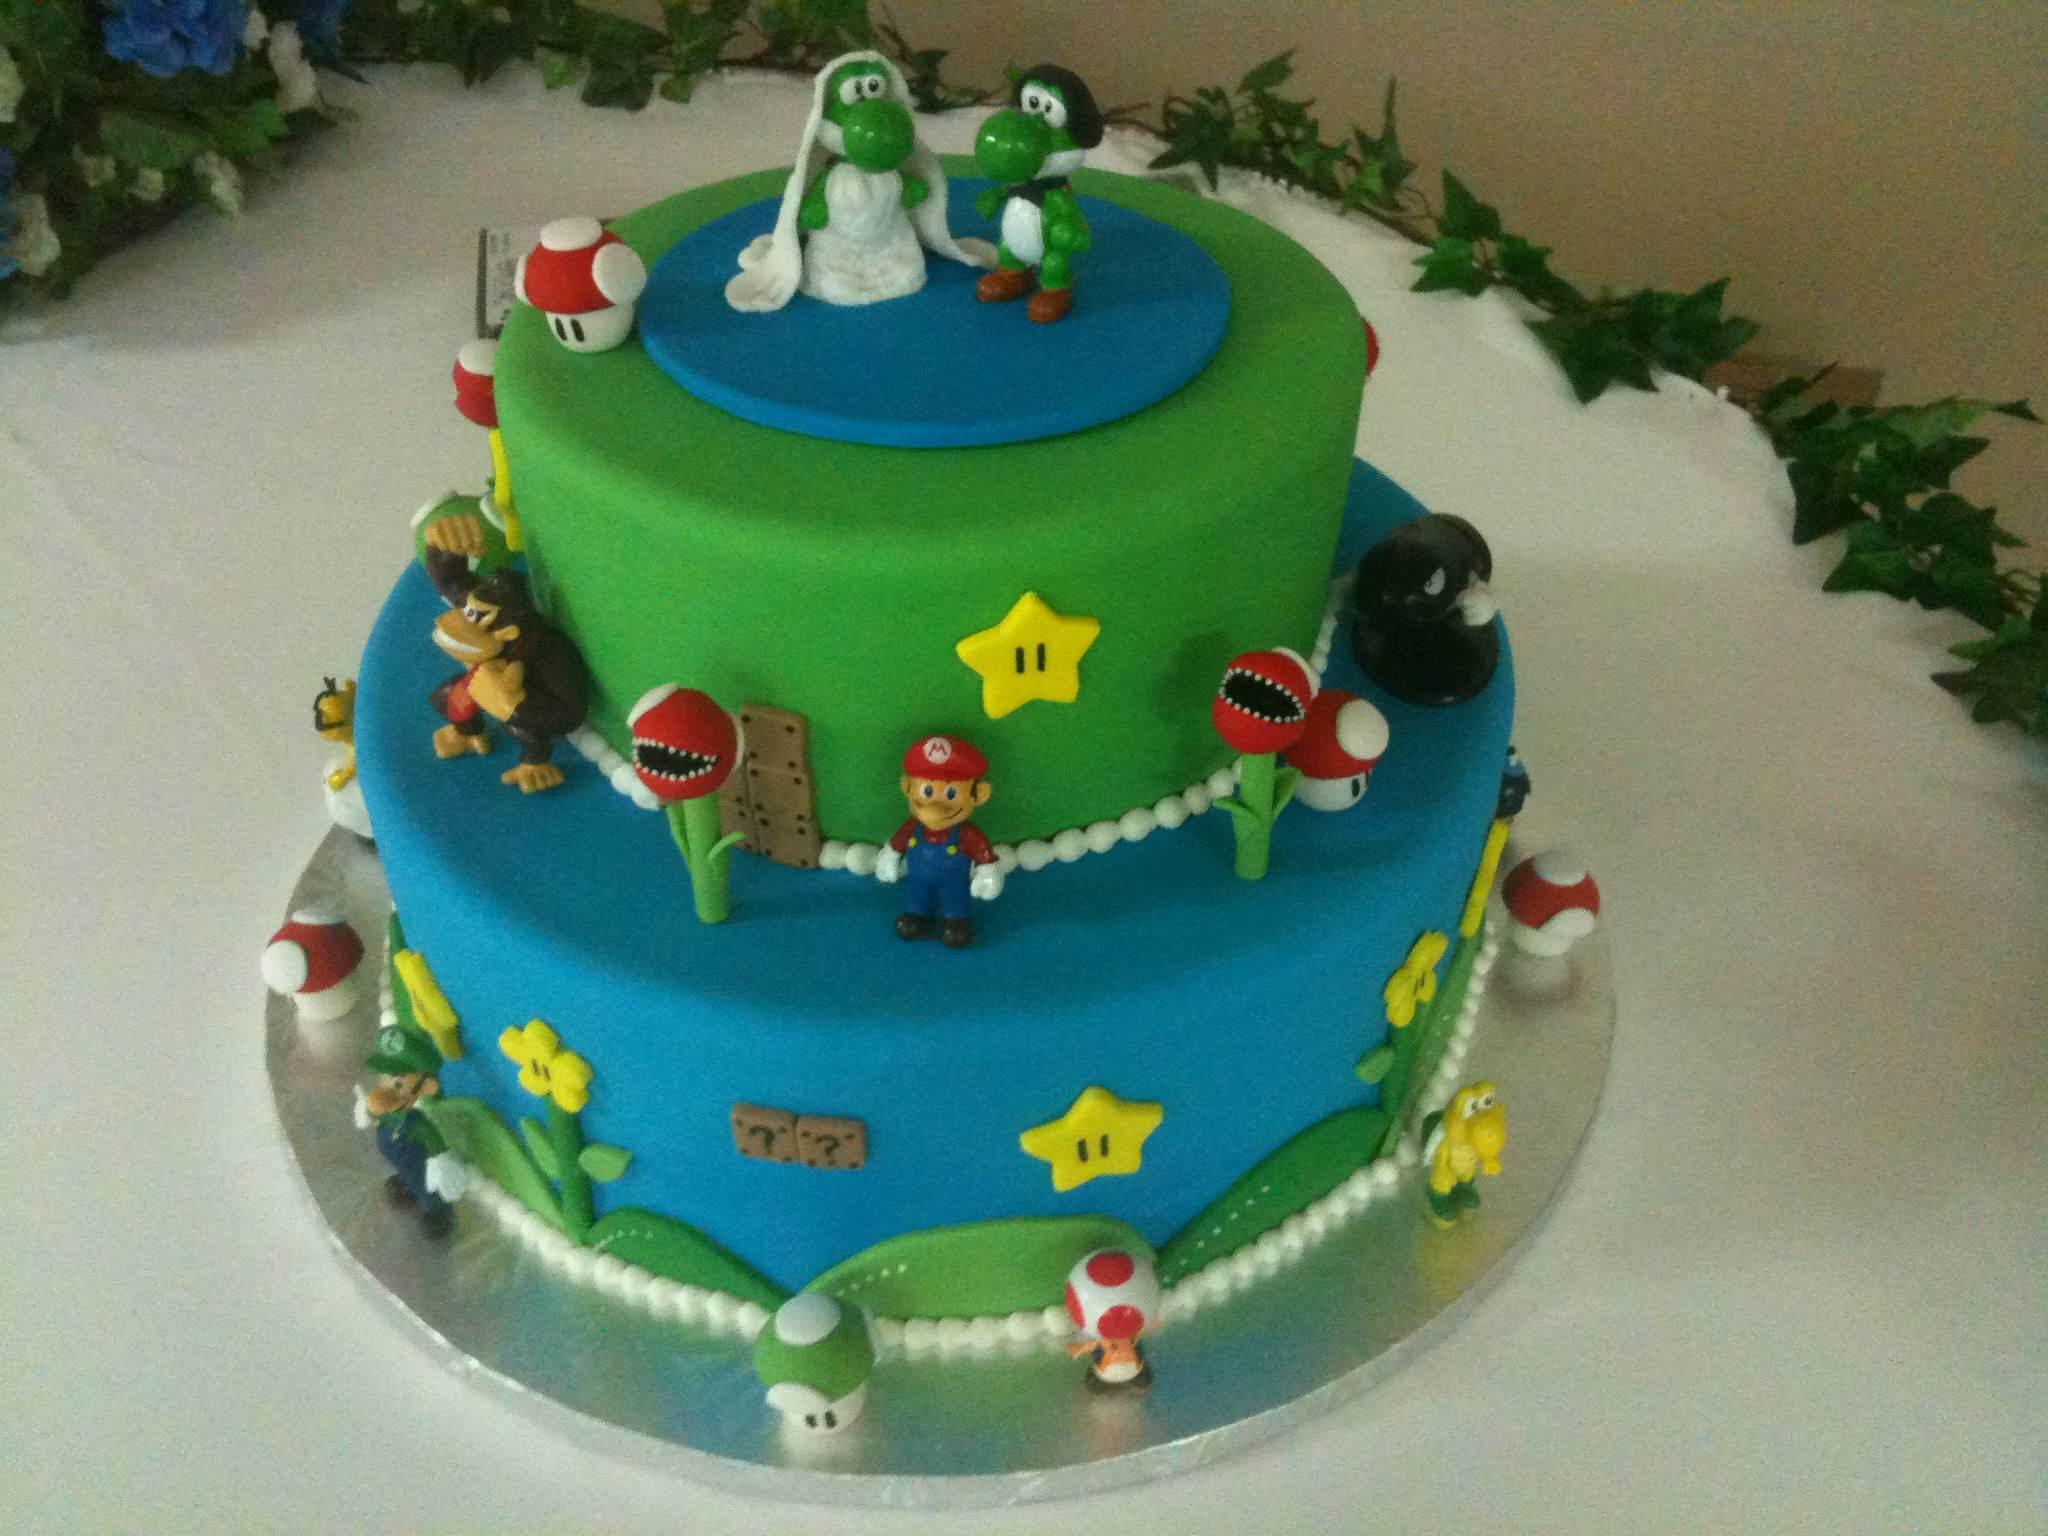 A & A wedding, groom's cake